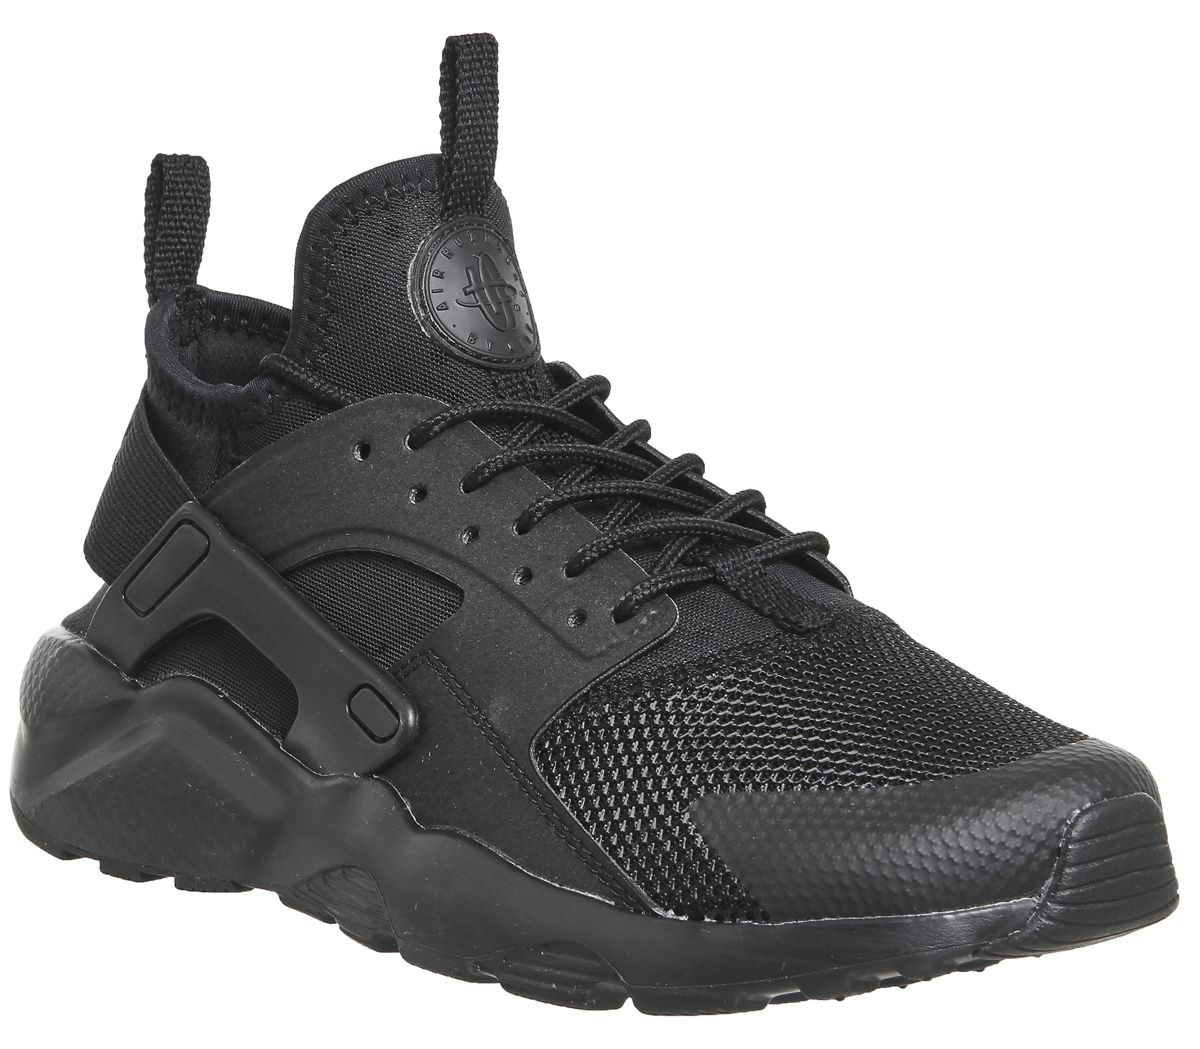 8a8215683ef3d Nike Huarache Ultra Trainers Black - Hers trainers